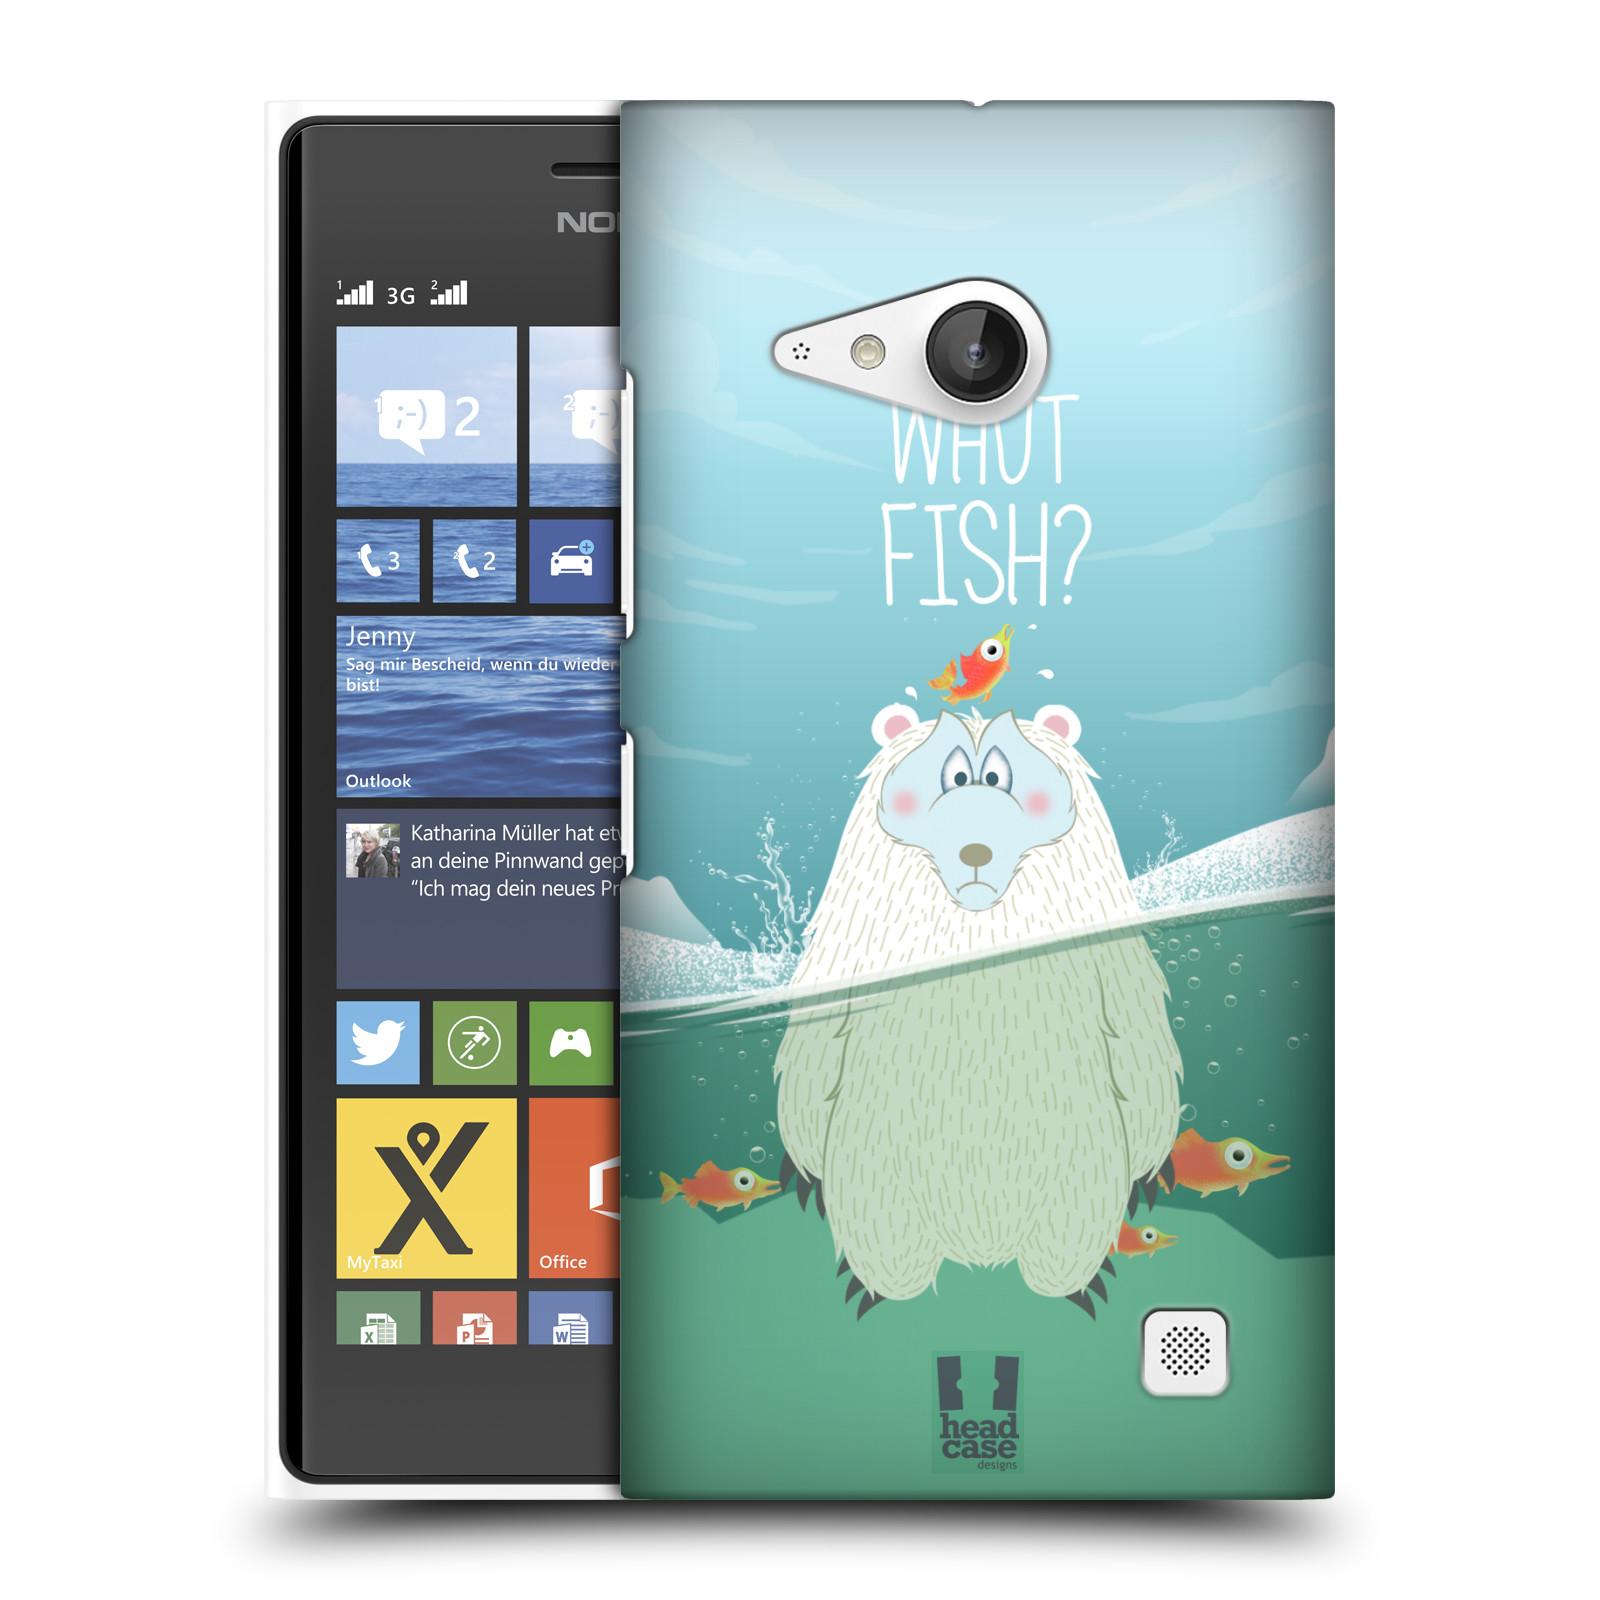 Plastové pouzdro na mobil Nokia Lumia 735 HEAD CASE Medvěd Whut Fish?